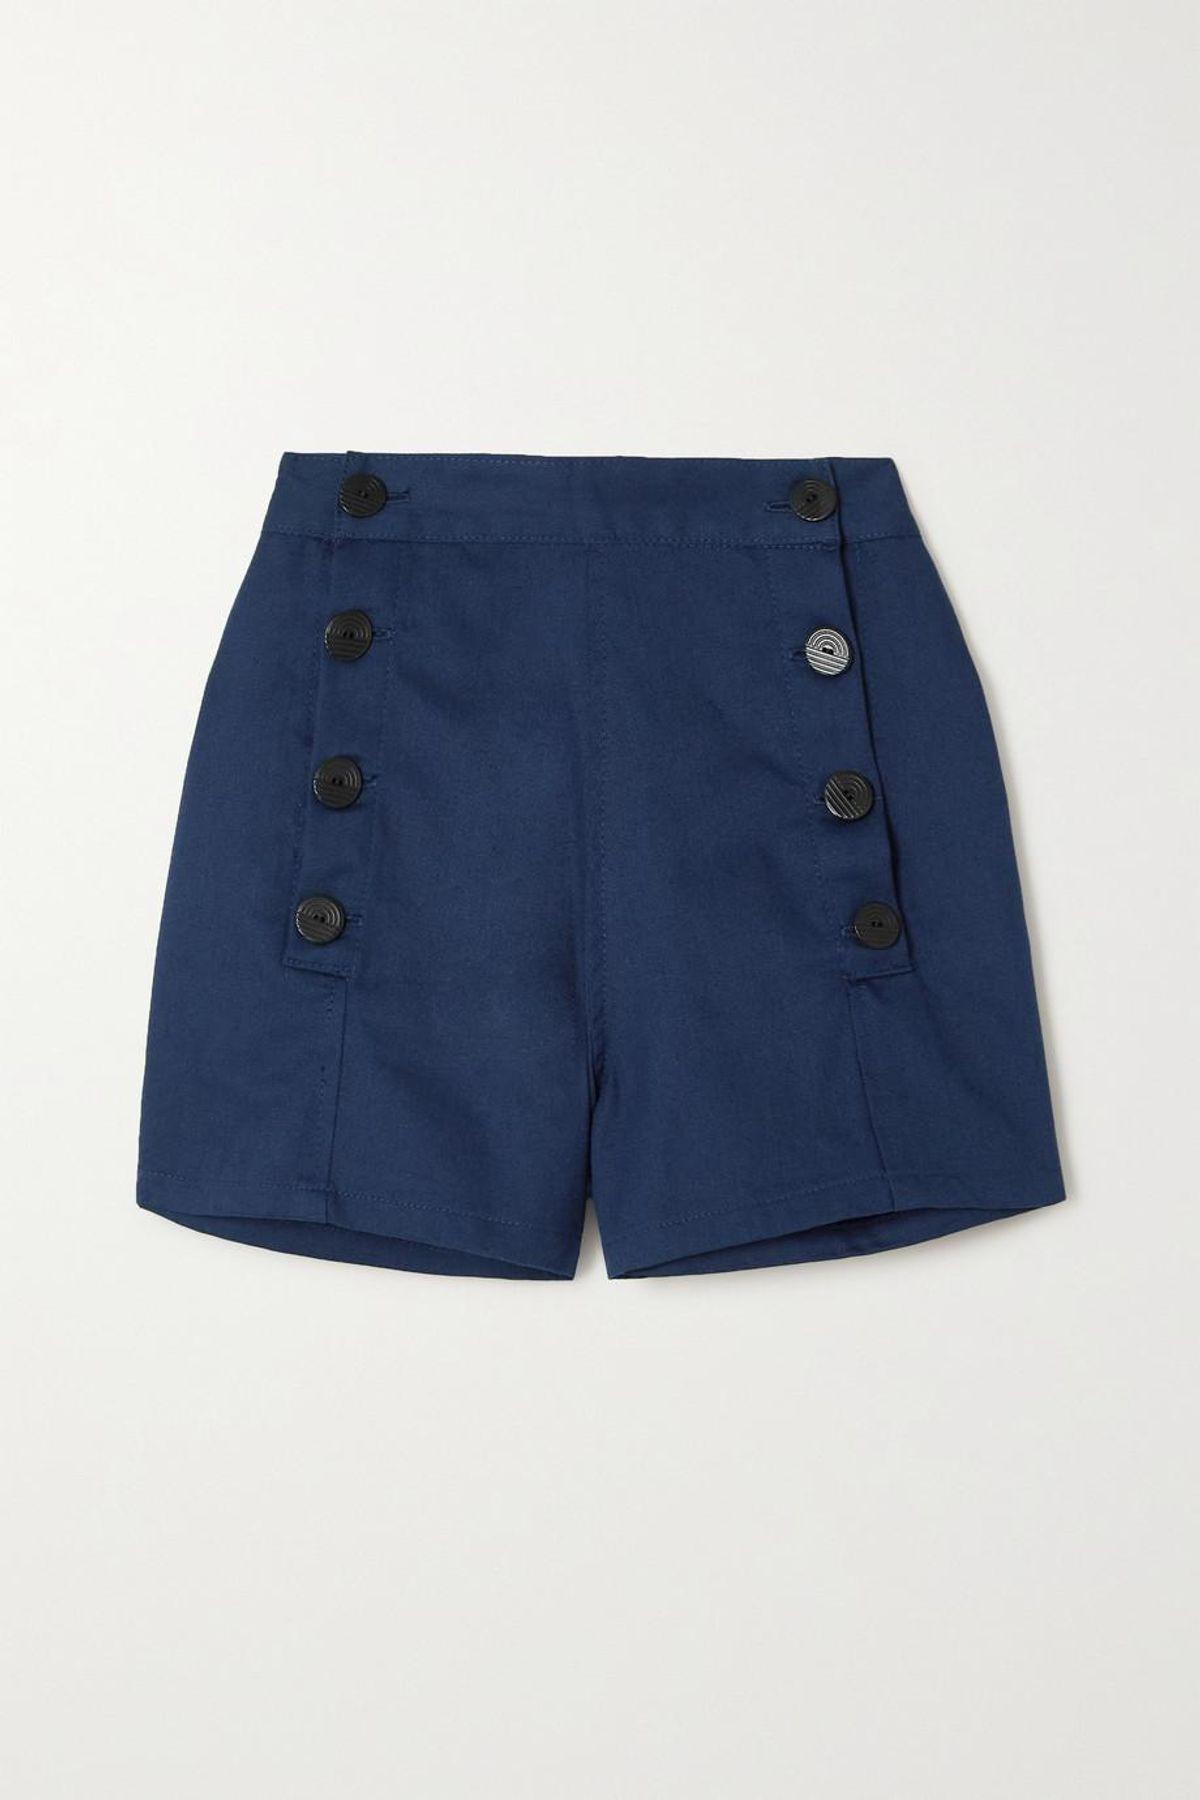 Sailor Cotton Twill Shorts